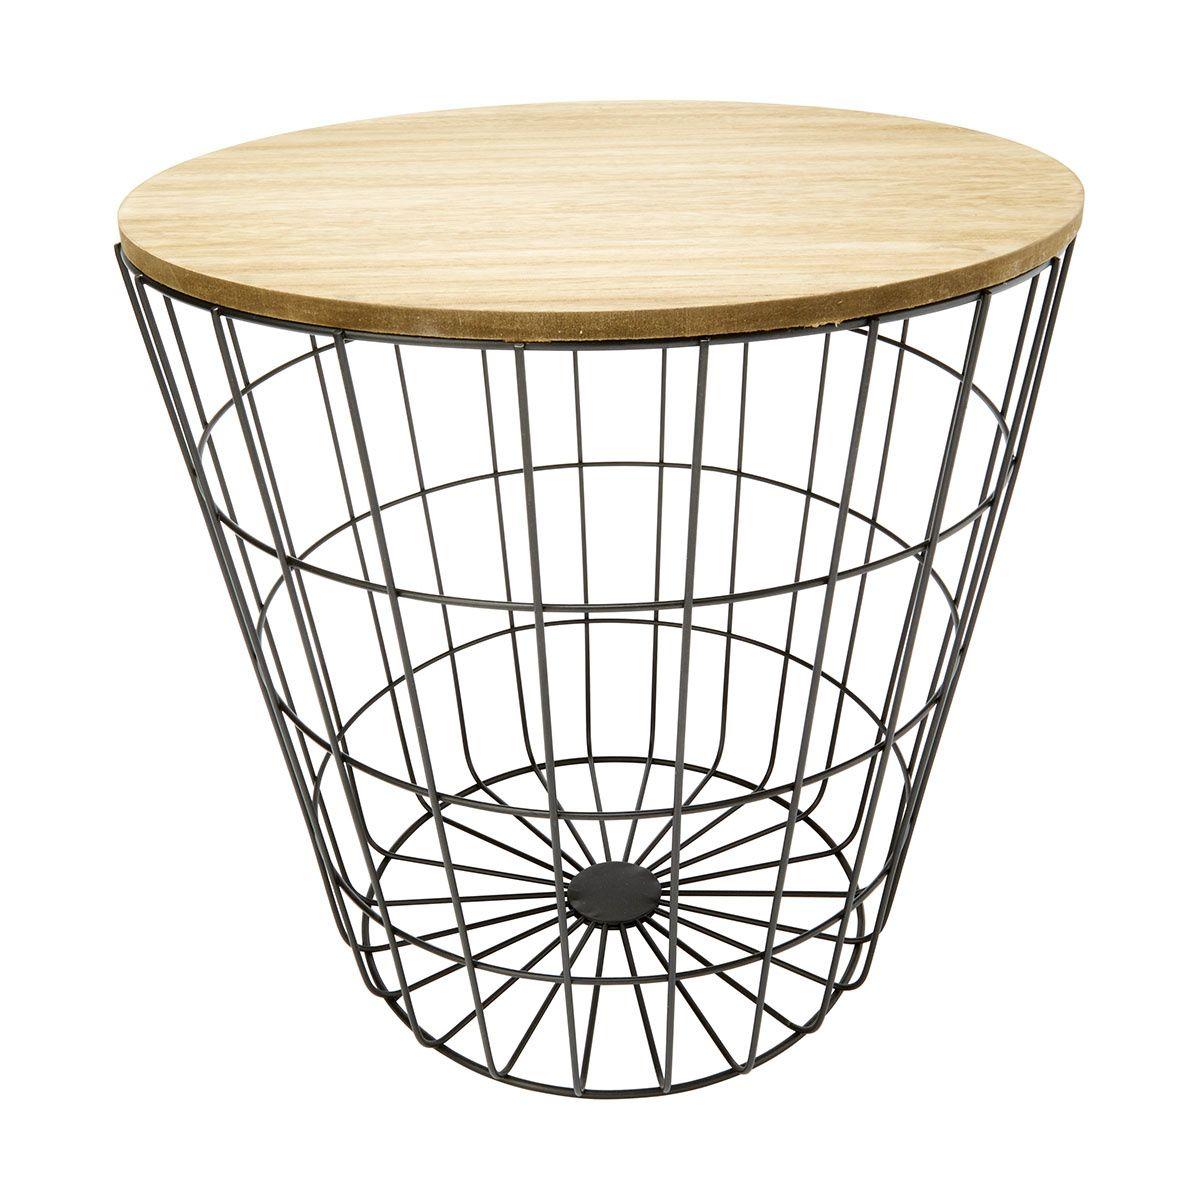 Storage wire basket table natural black kmart formal storage wire basket table natural black kmart greentooth Choice Image